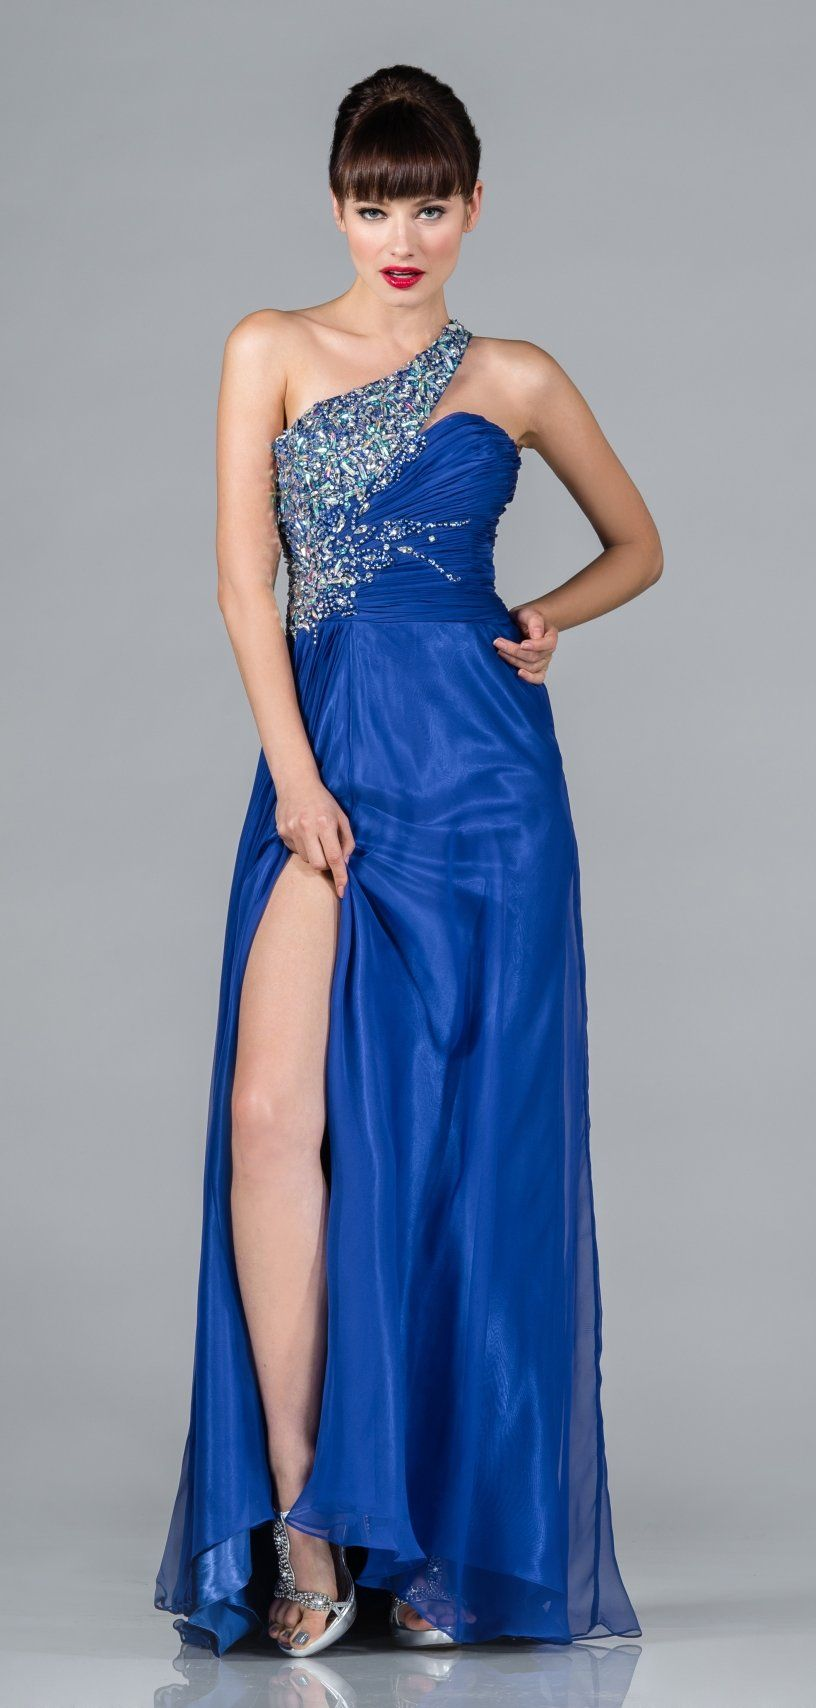 Rhinestone shoulder strap royal blue dress long chiffon elegant gown